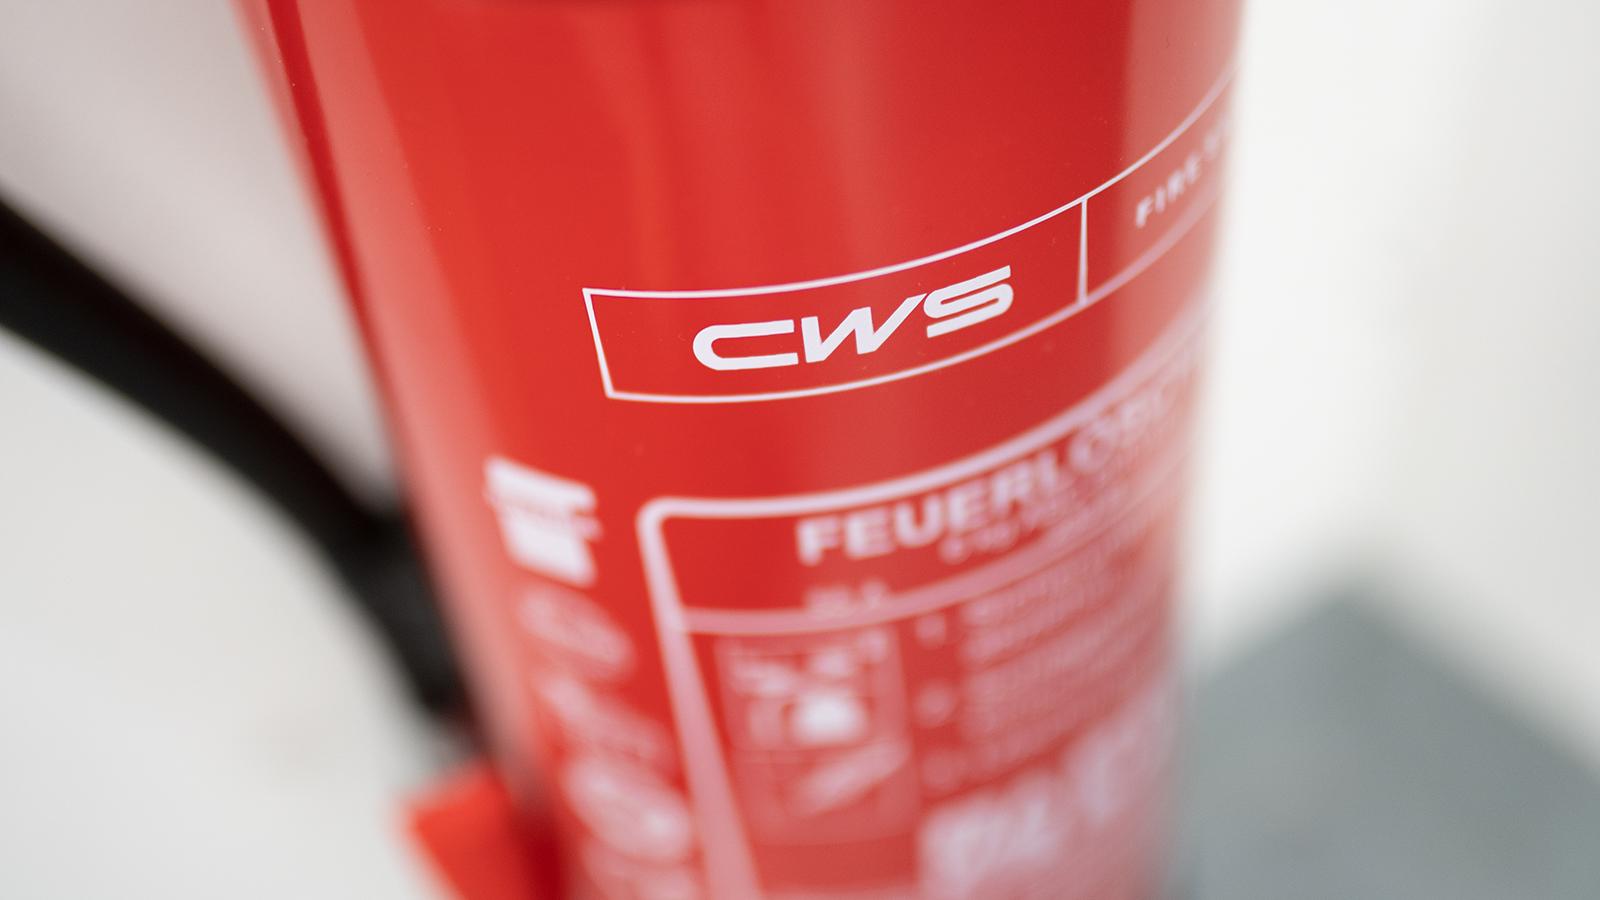 Brandschutztechniker bei CWS Fire Safety - Feuerlöscher